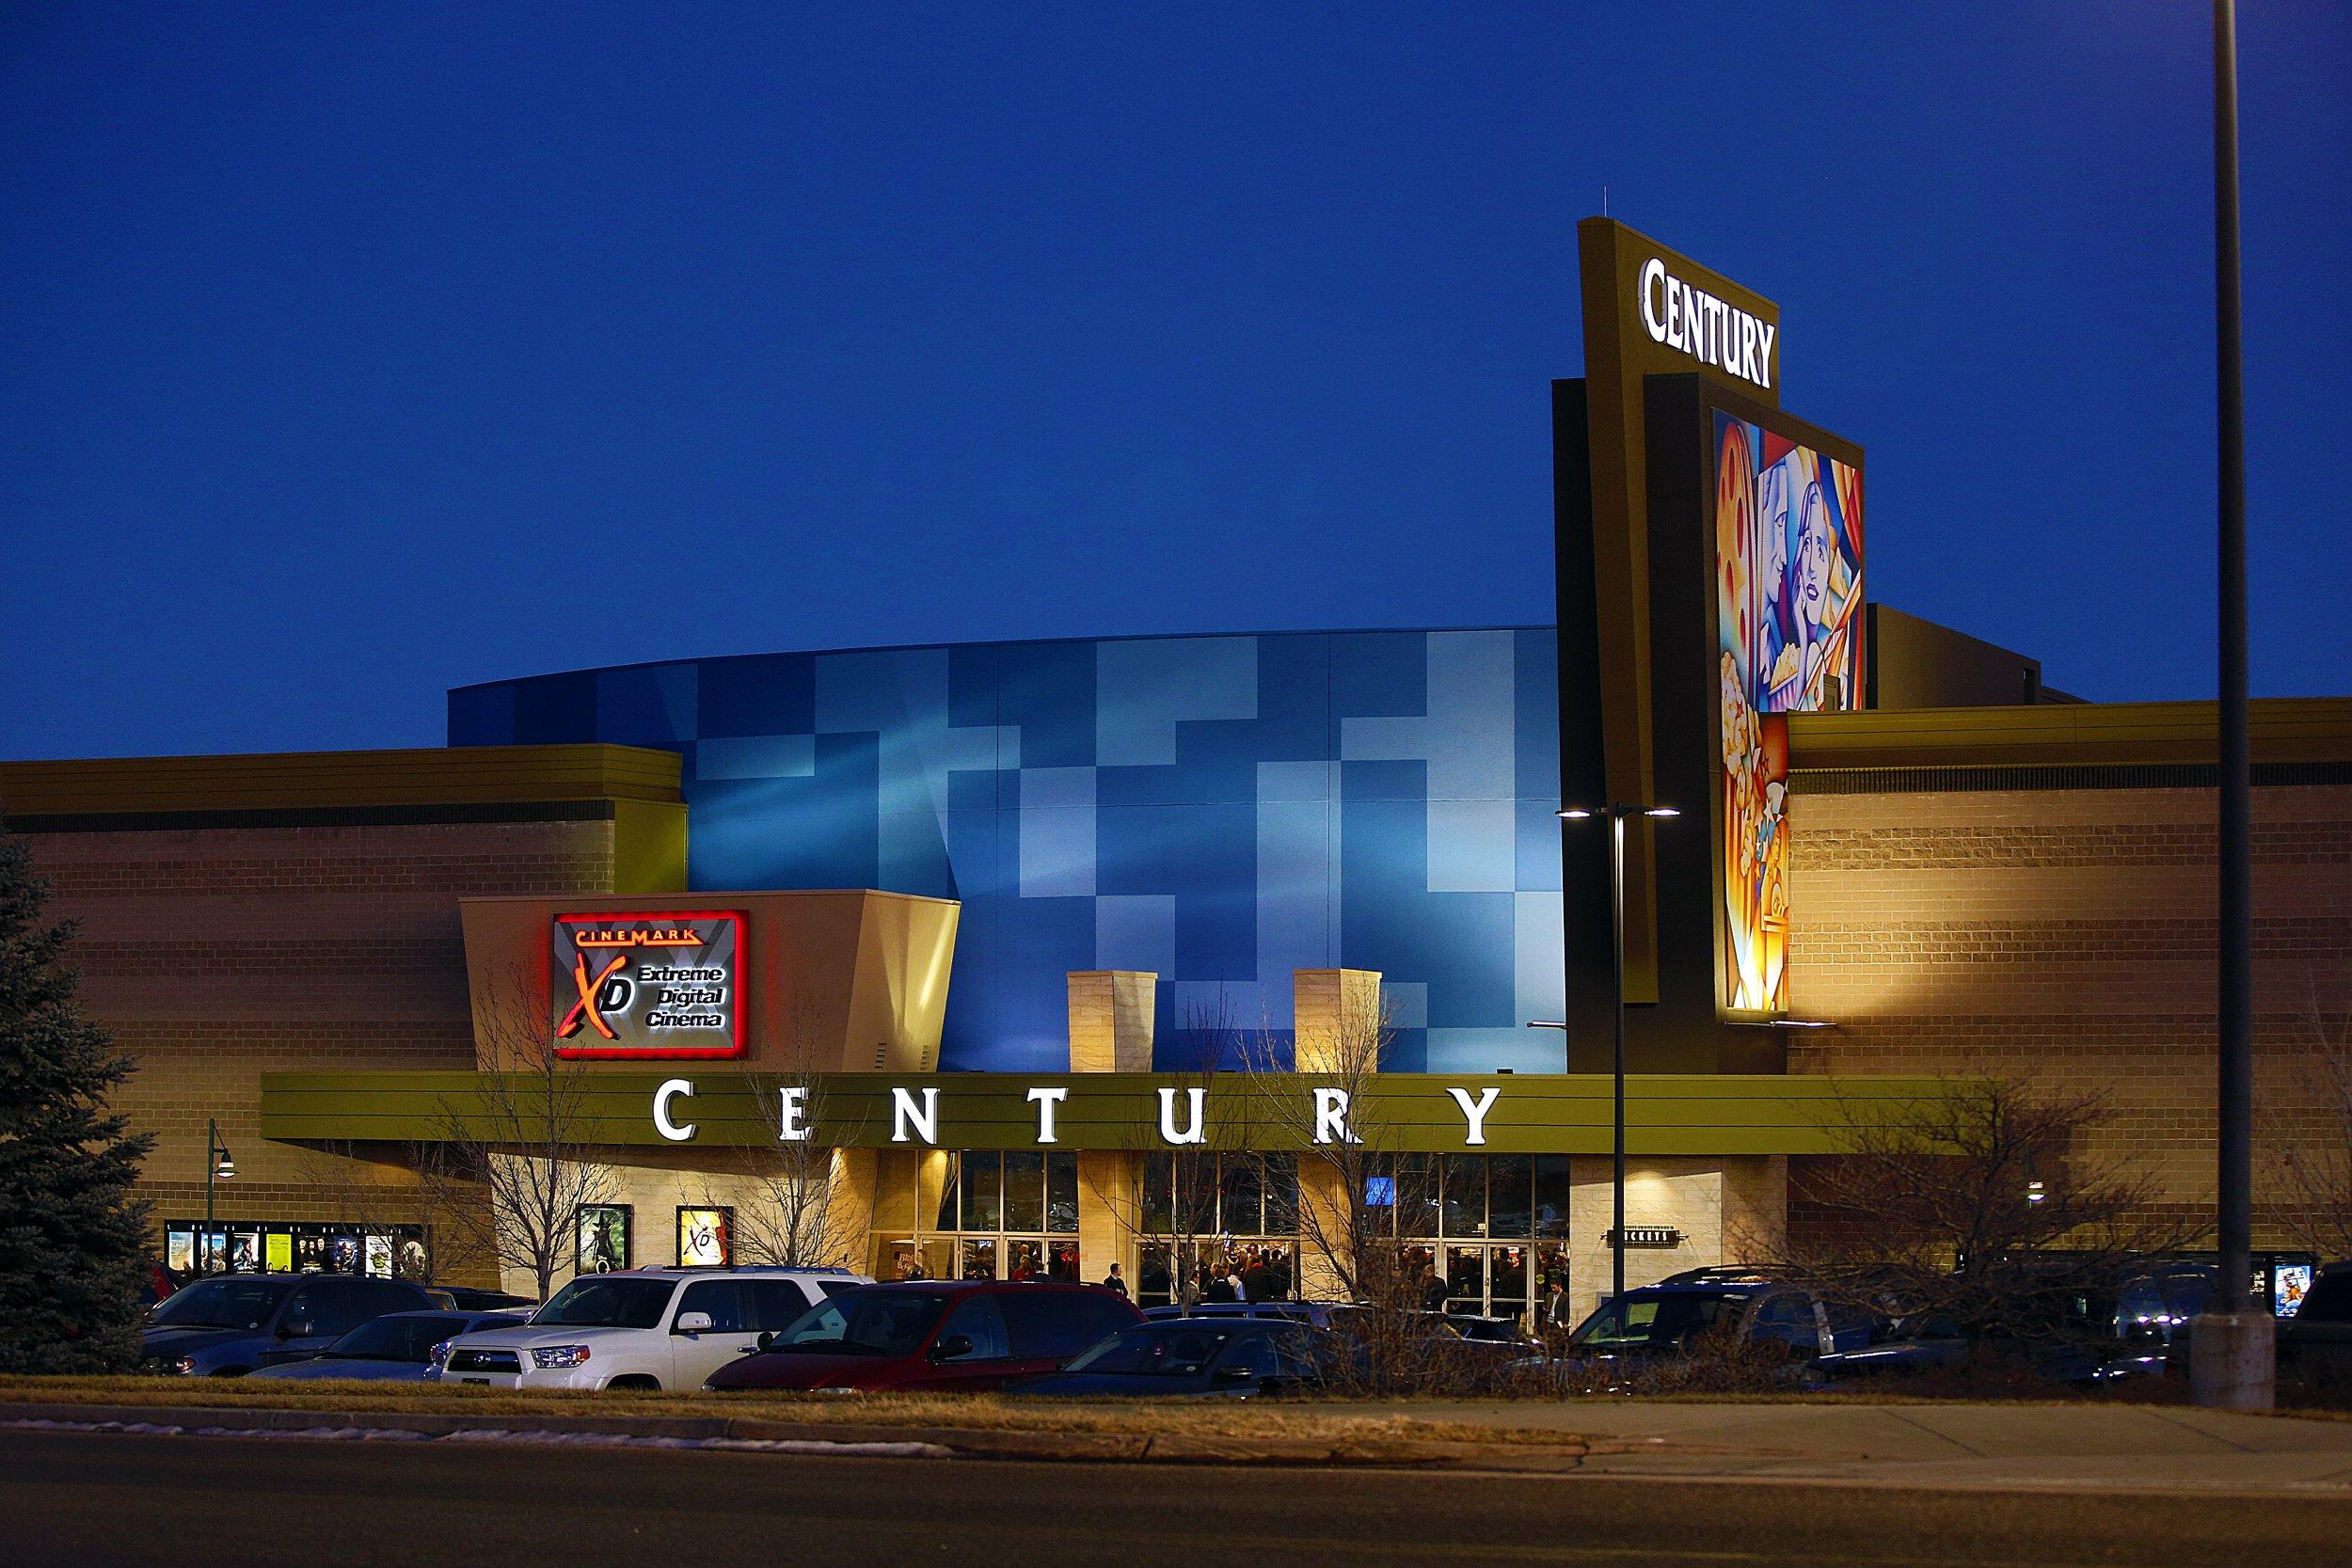 Cinemark Century in Aurora, Colorado